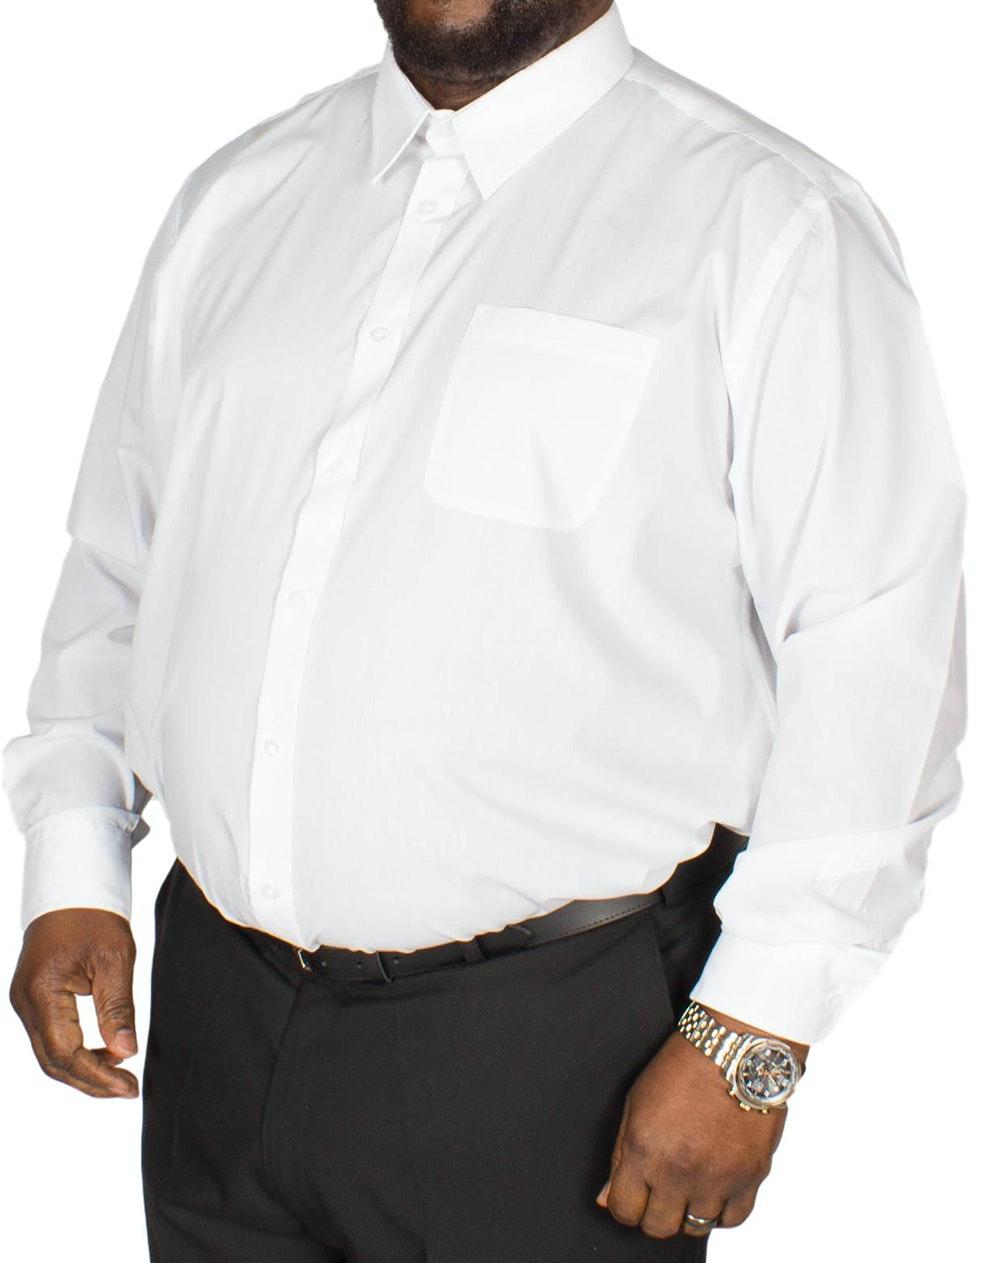 D555 Aiden Long Sleeve Classic Shirt White